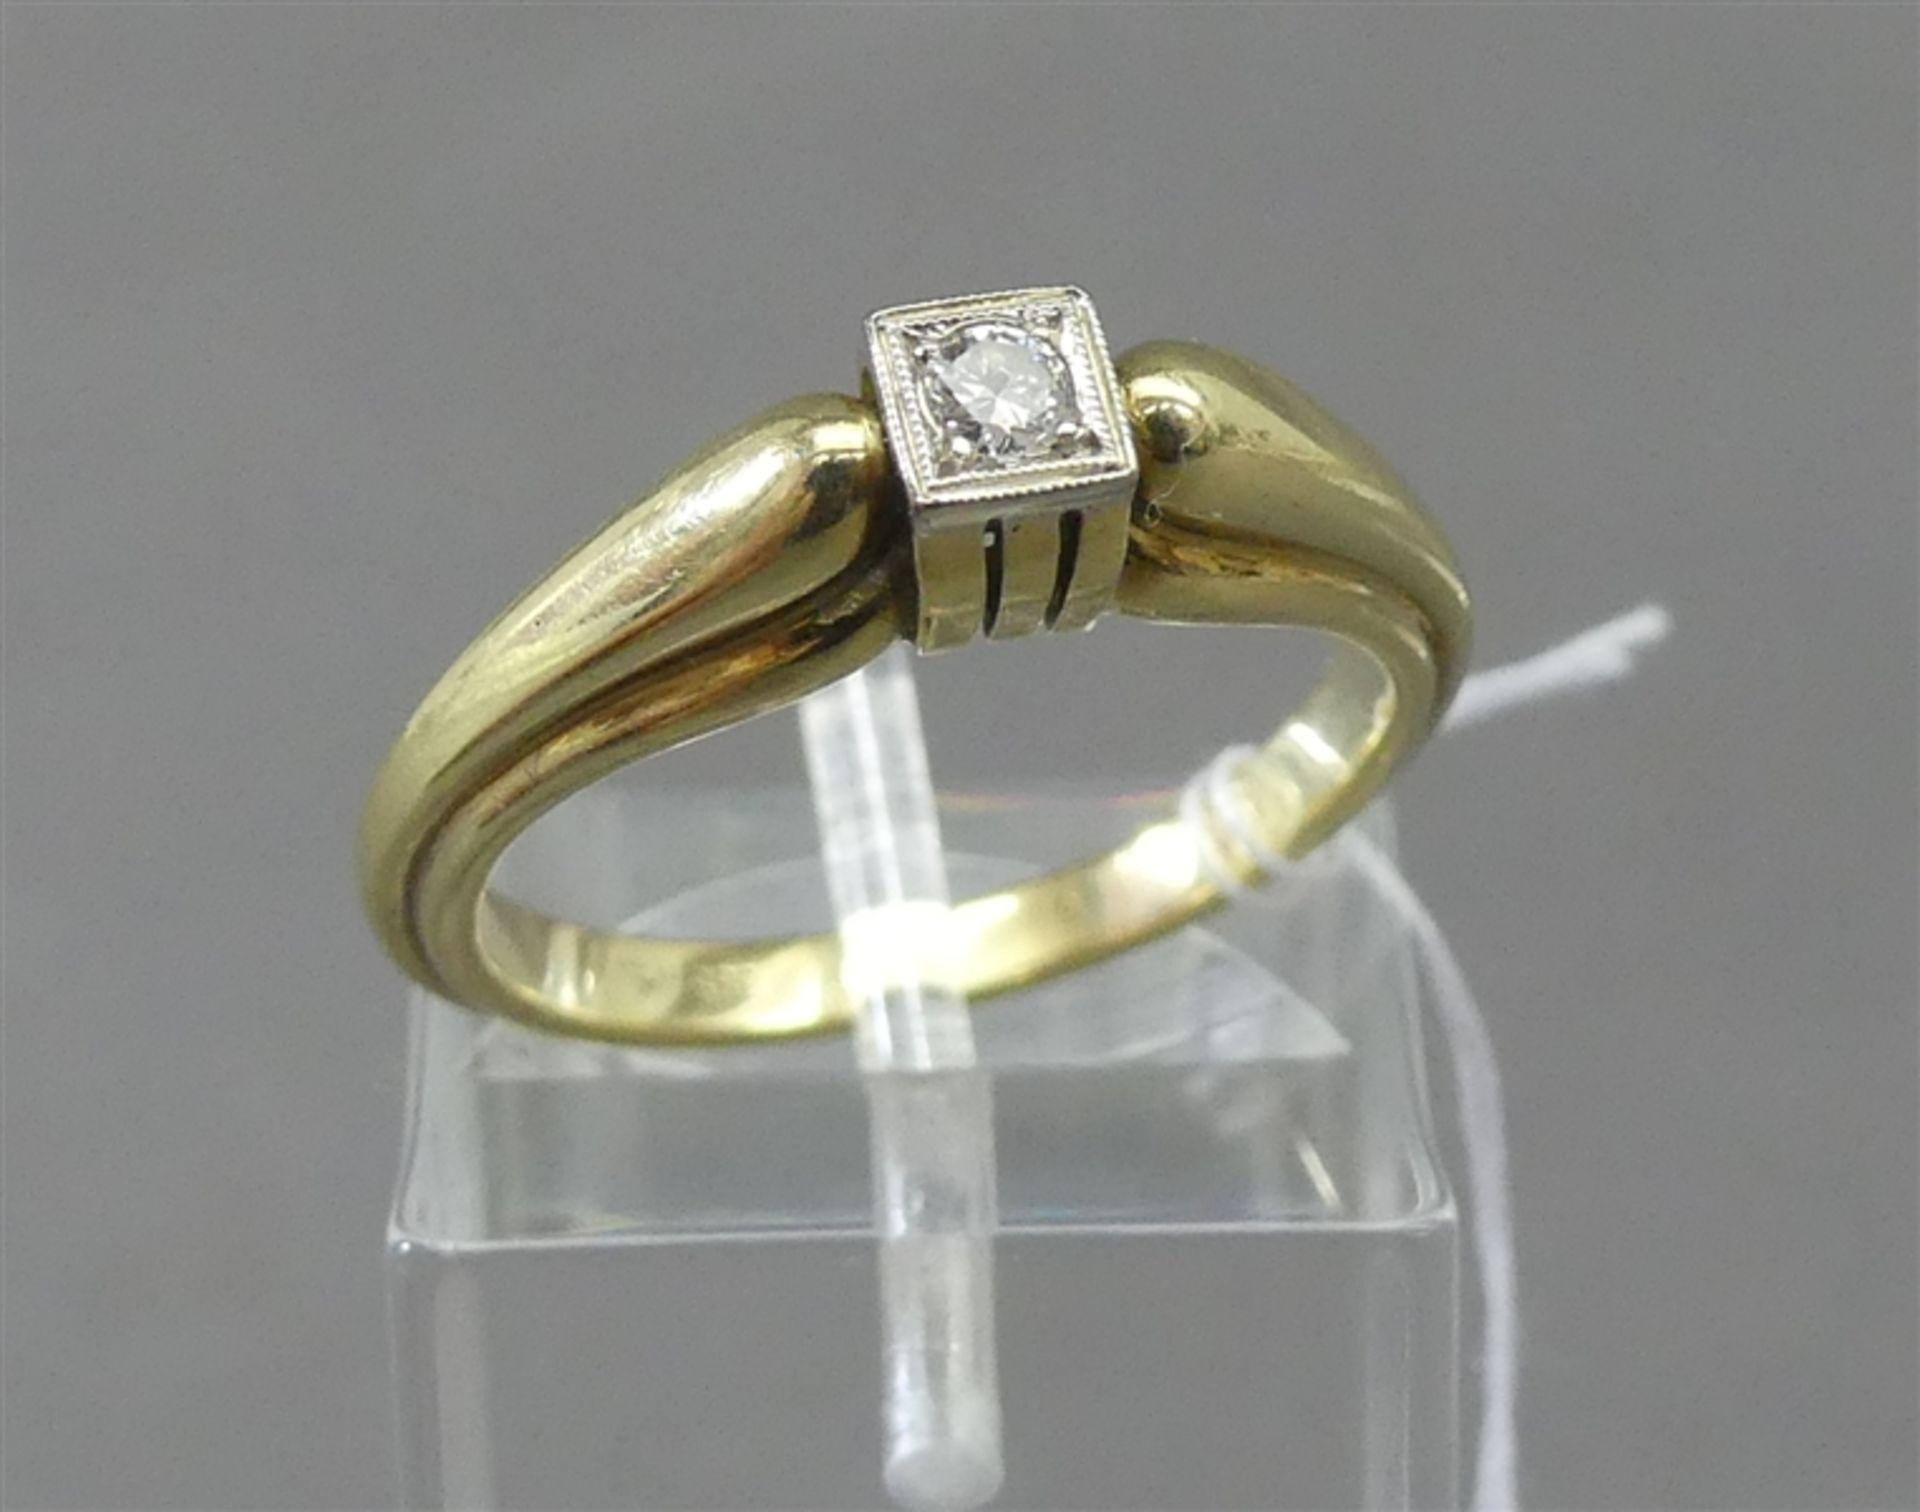 Damenring 14 kt. Gelbgold, 1 Brillant, ca 0,07 ct., weiß, si, ca 4g, RM 56,